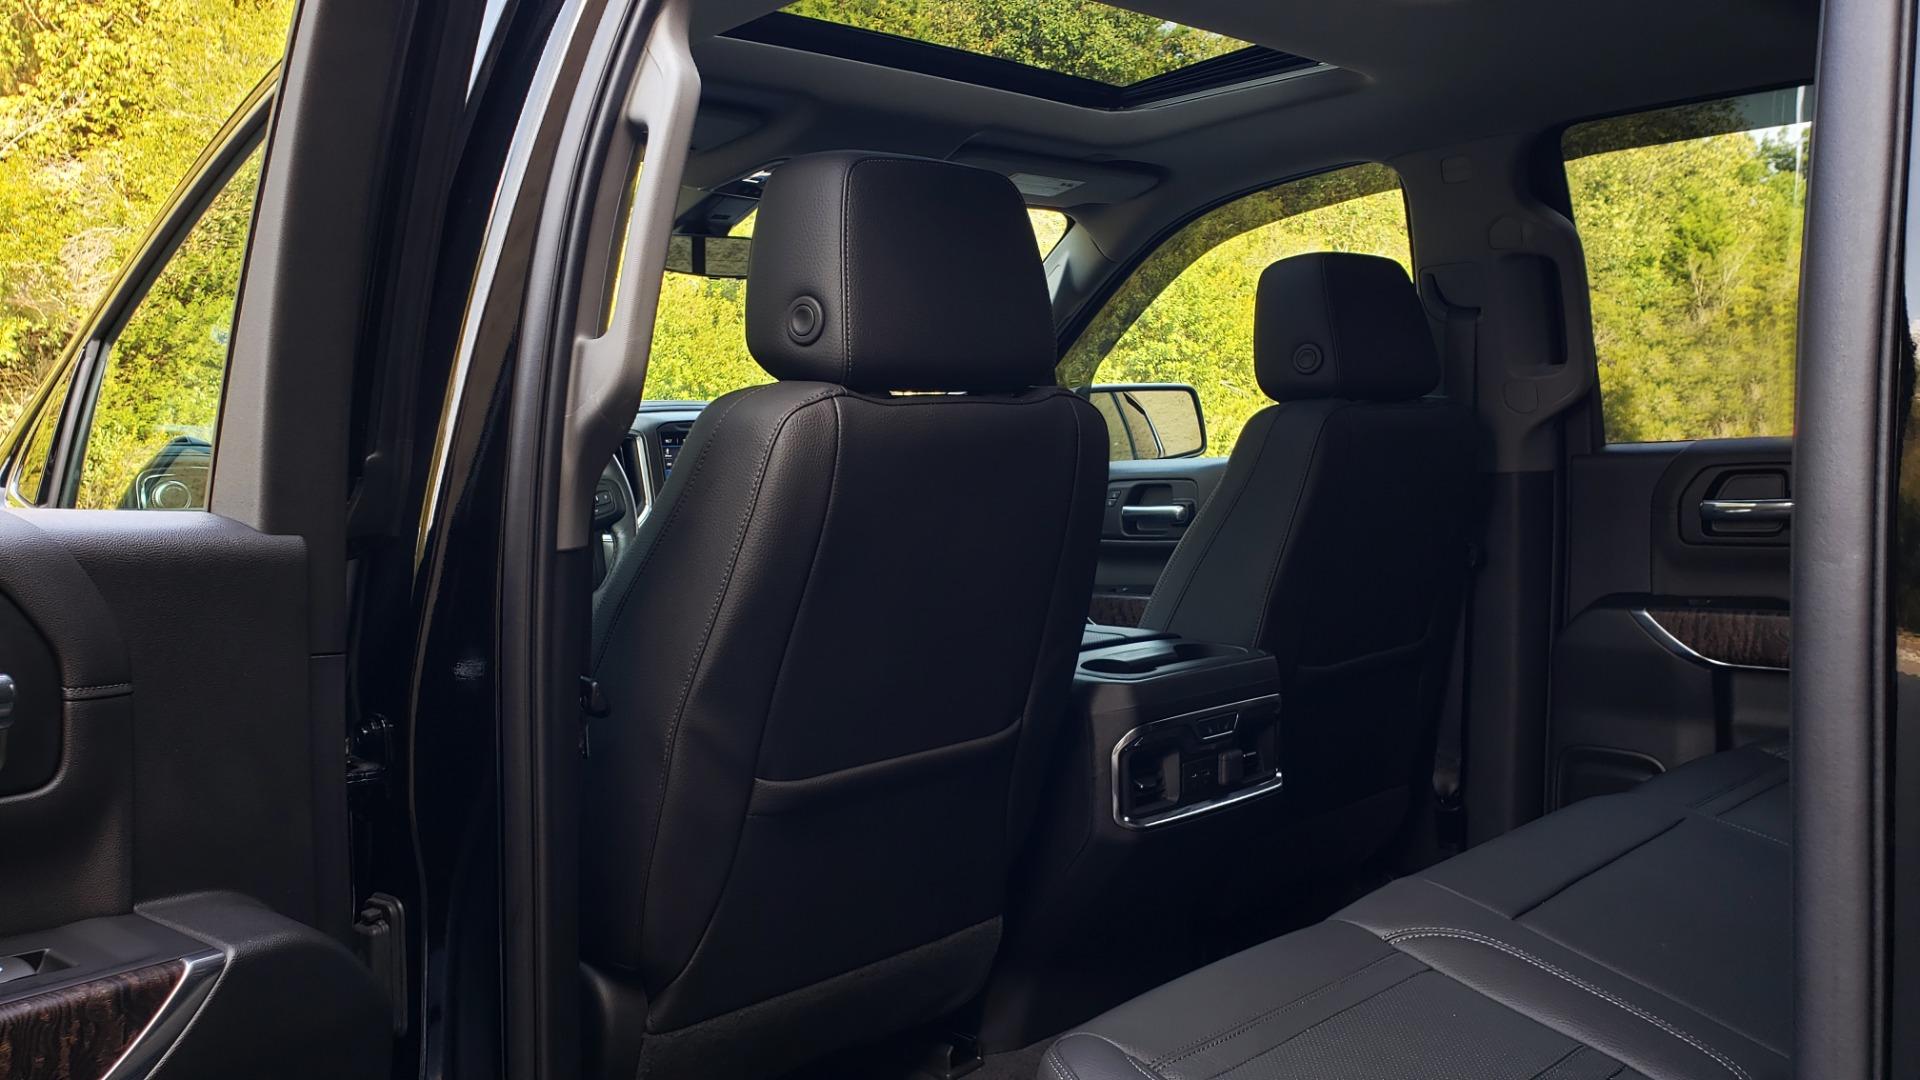 Used 2019 GMC SIERRA 1500 DENALI ULTIMATE 4WD / NAV / TECH PKG / DRVR ALRT for sale Sold at Formula Imports in Charlotte NC 28227 66